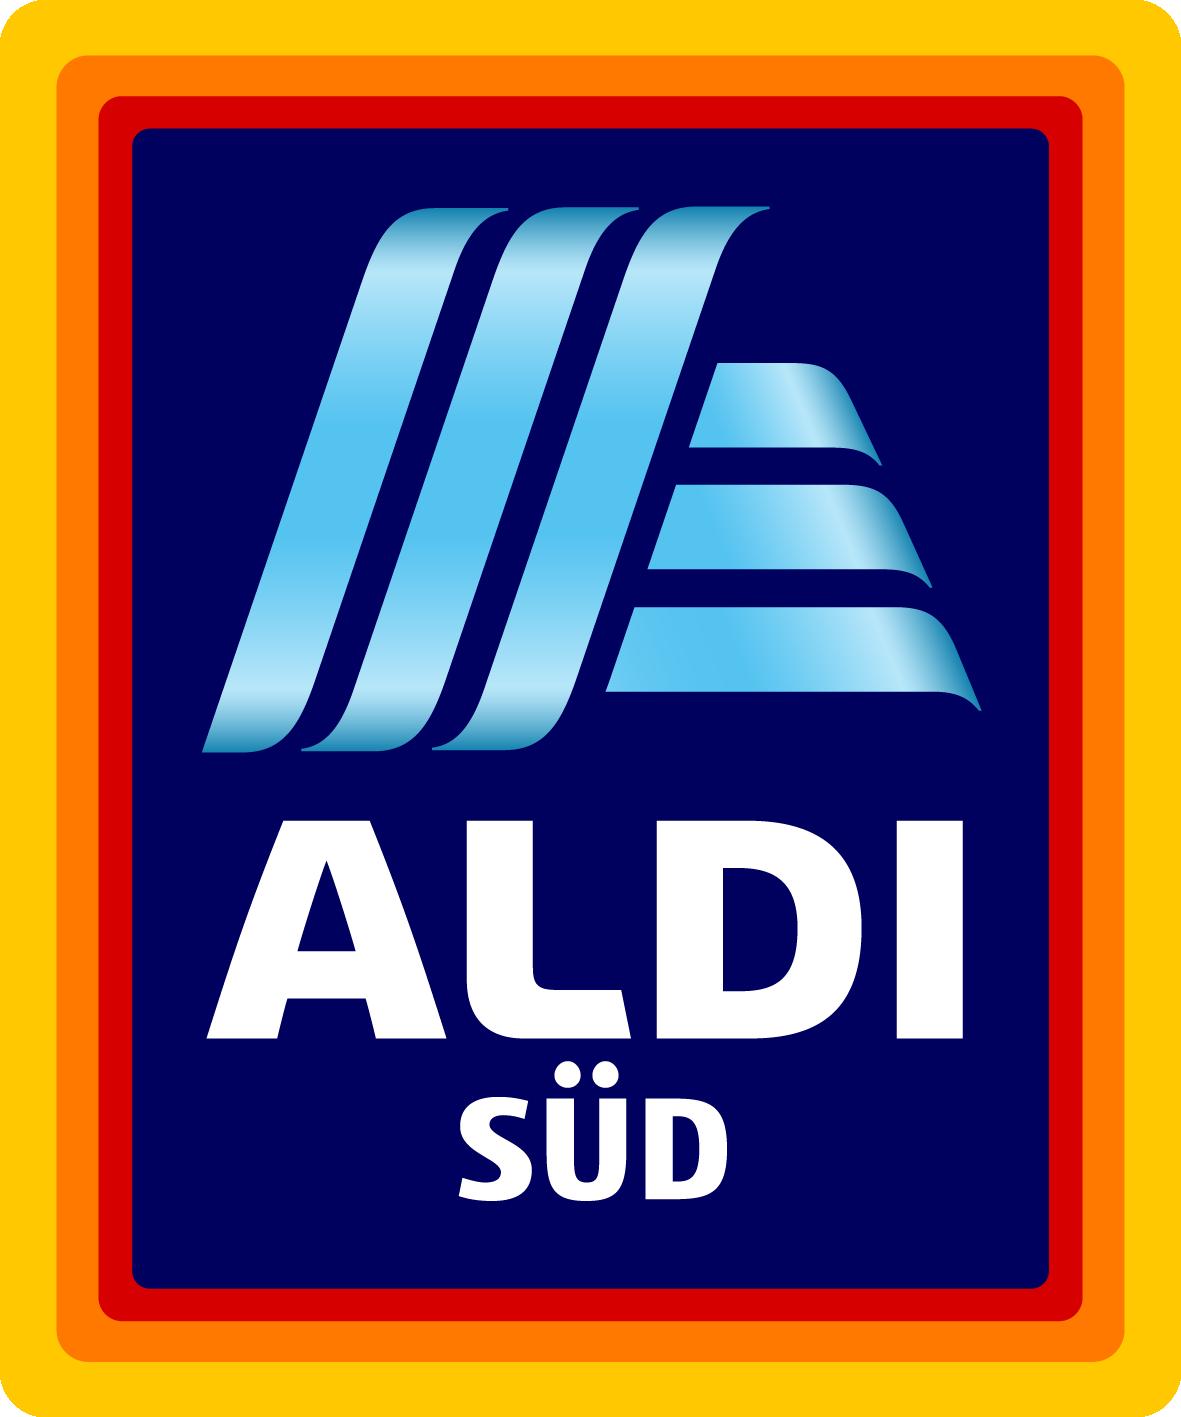 ALDI_SUED_Logo_300dpi.png